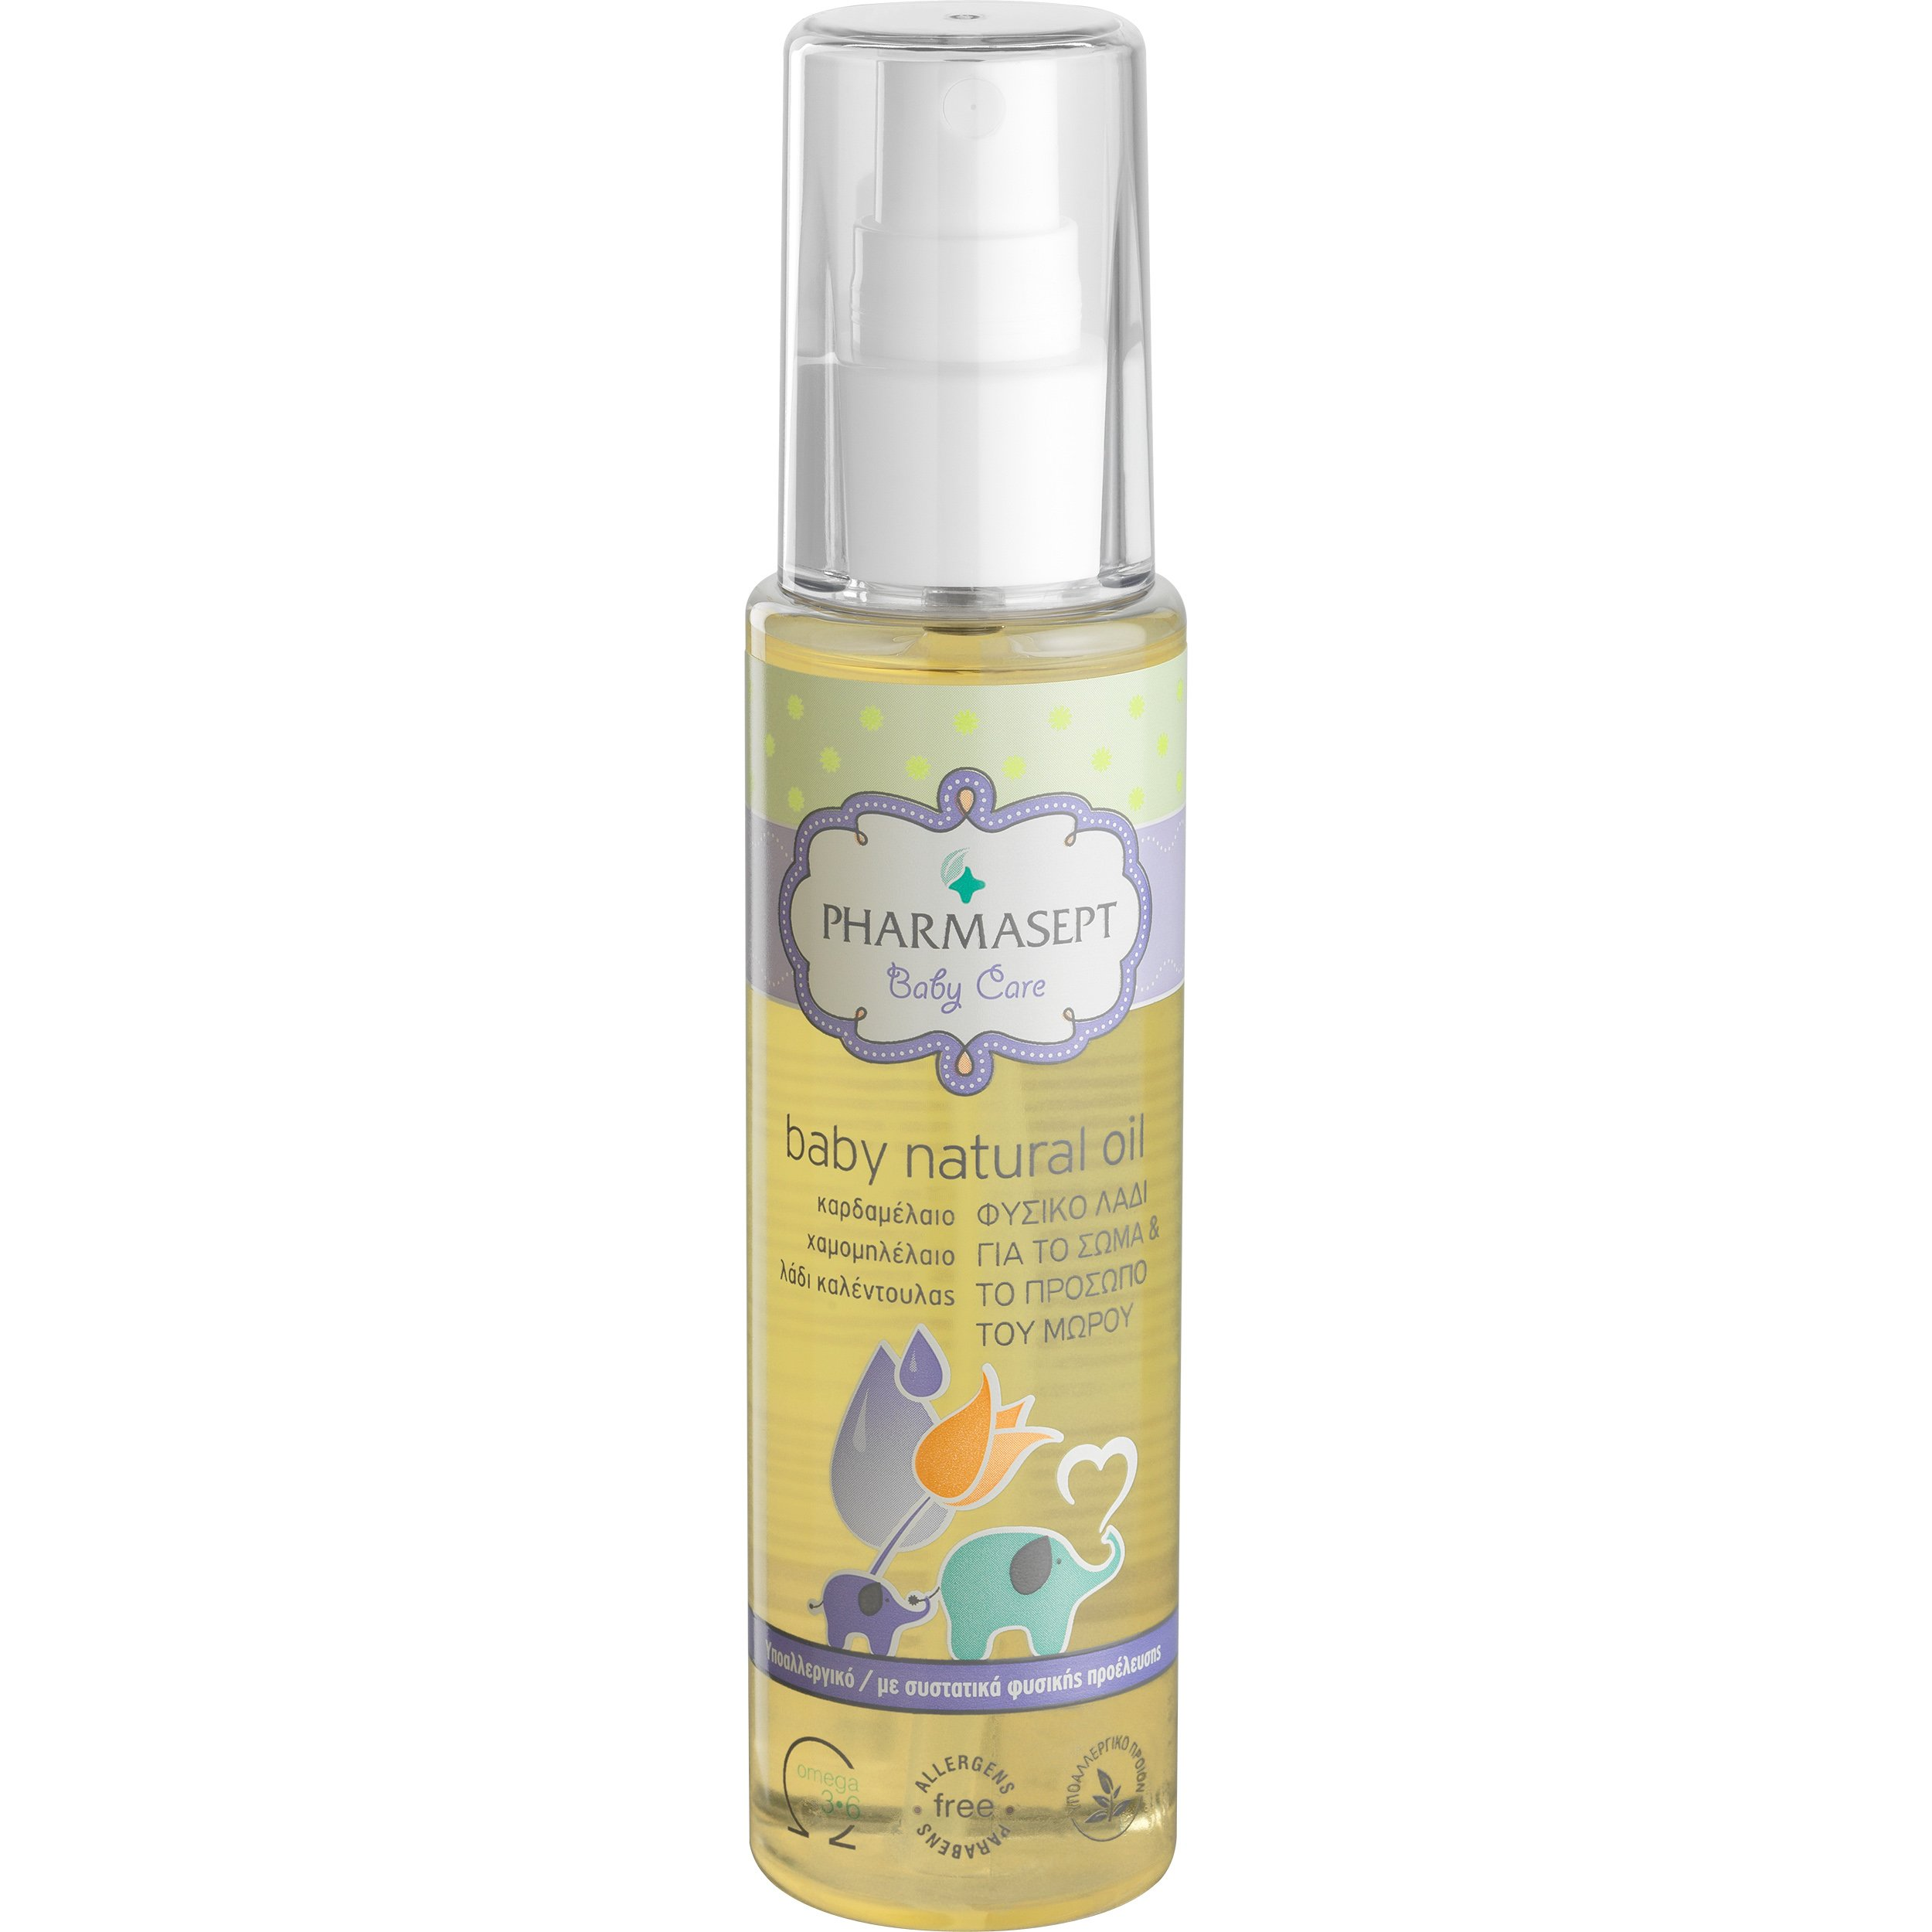 Pharmasept Baby Care Baby Natural Oil Βρεφικό Υποαλλεργικό Λάδι Ενυδάτωσης & Φροντίδας με 100% Φυσική Σύνθεση 100ml